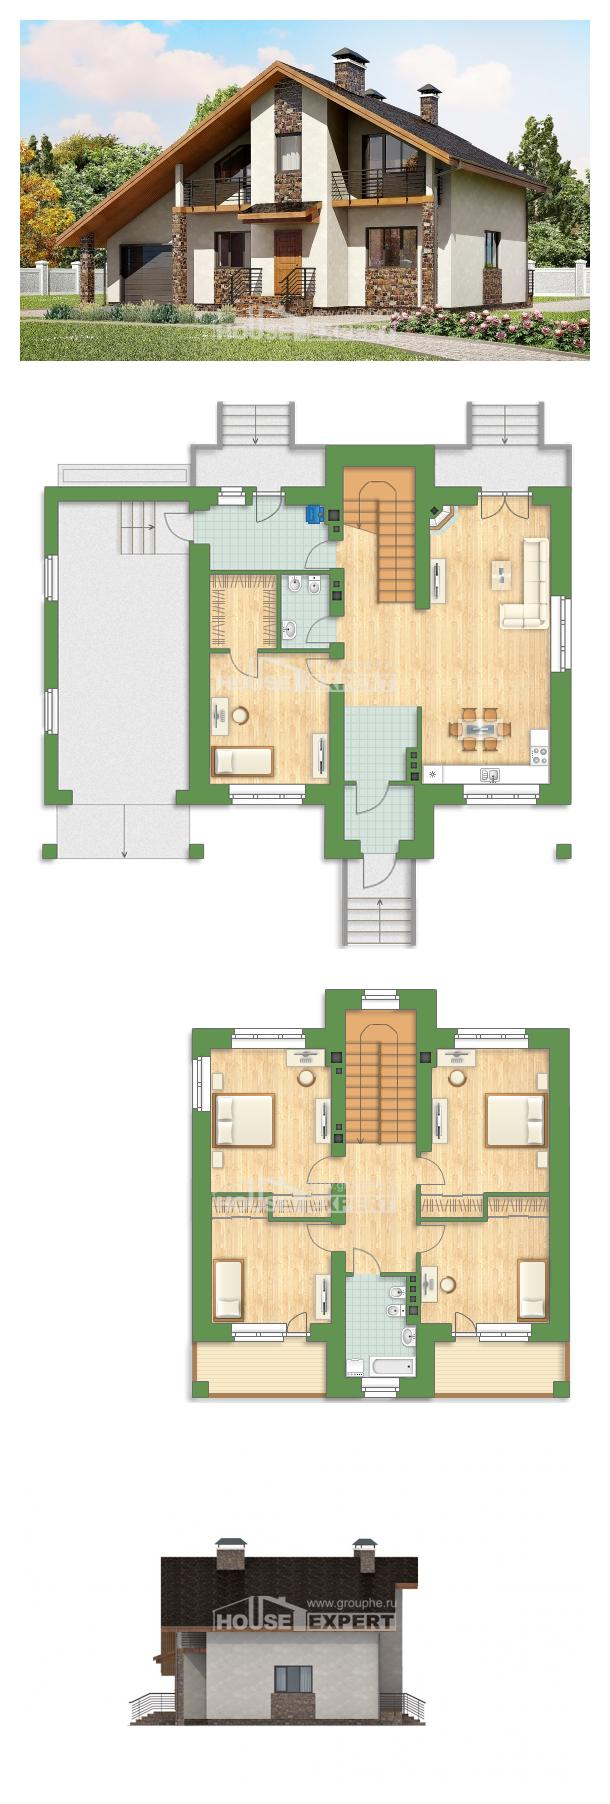 Projekt domu 180-008-L | House Expert